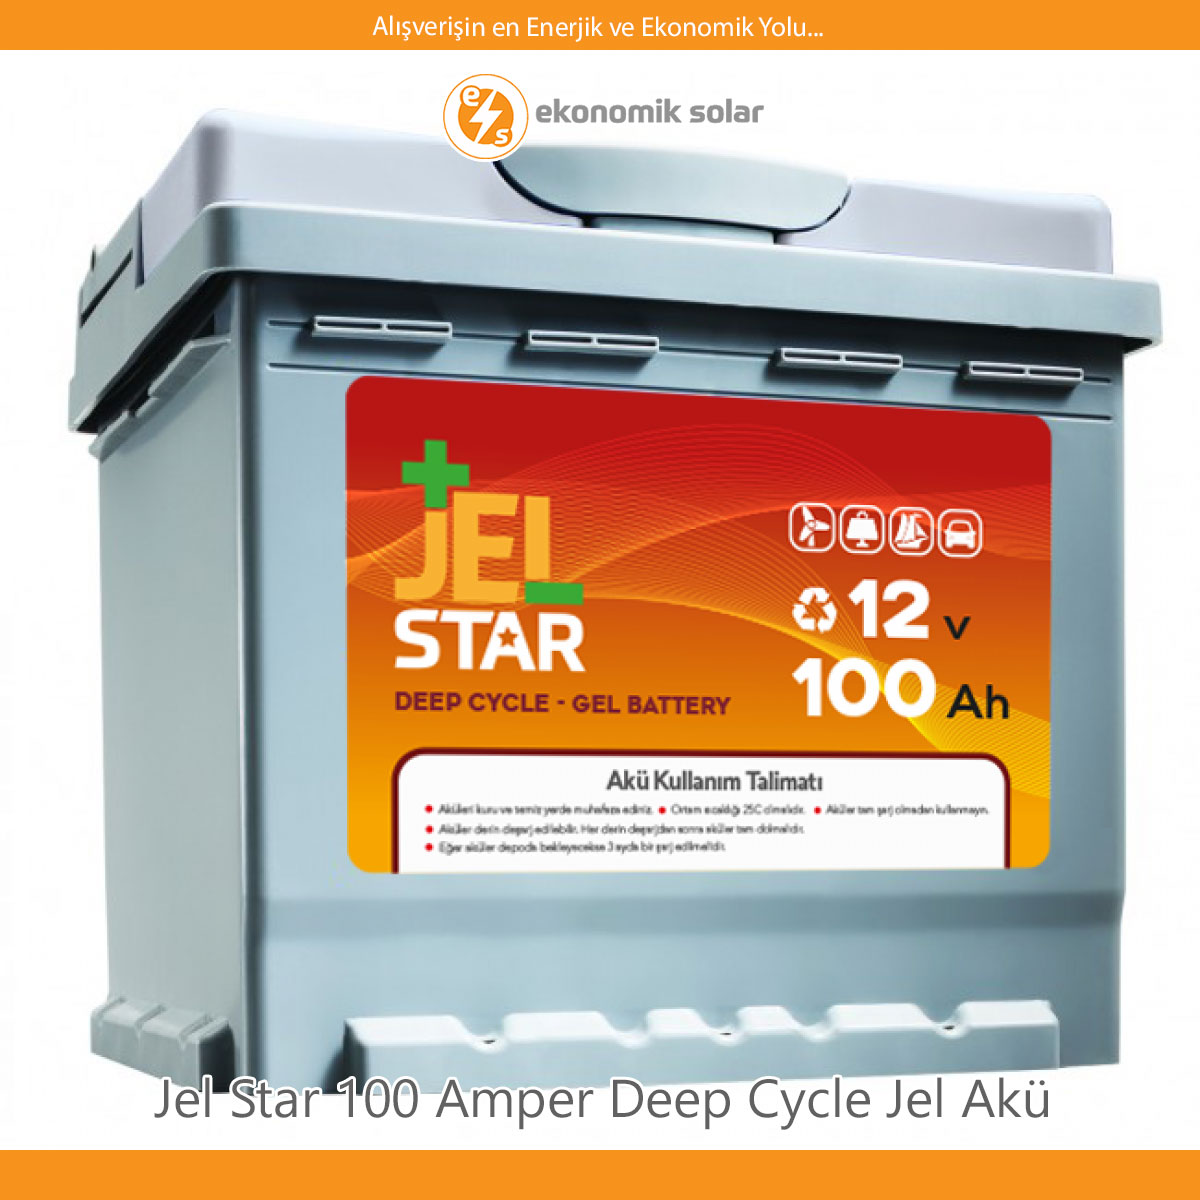 jel-star-100-amper-nano-karbon-jel-aku-yerli-uretim-urun-gorseli-486-1200×1200